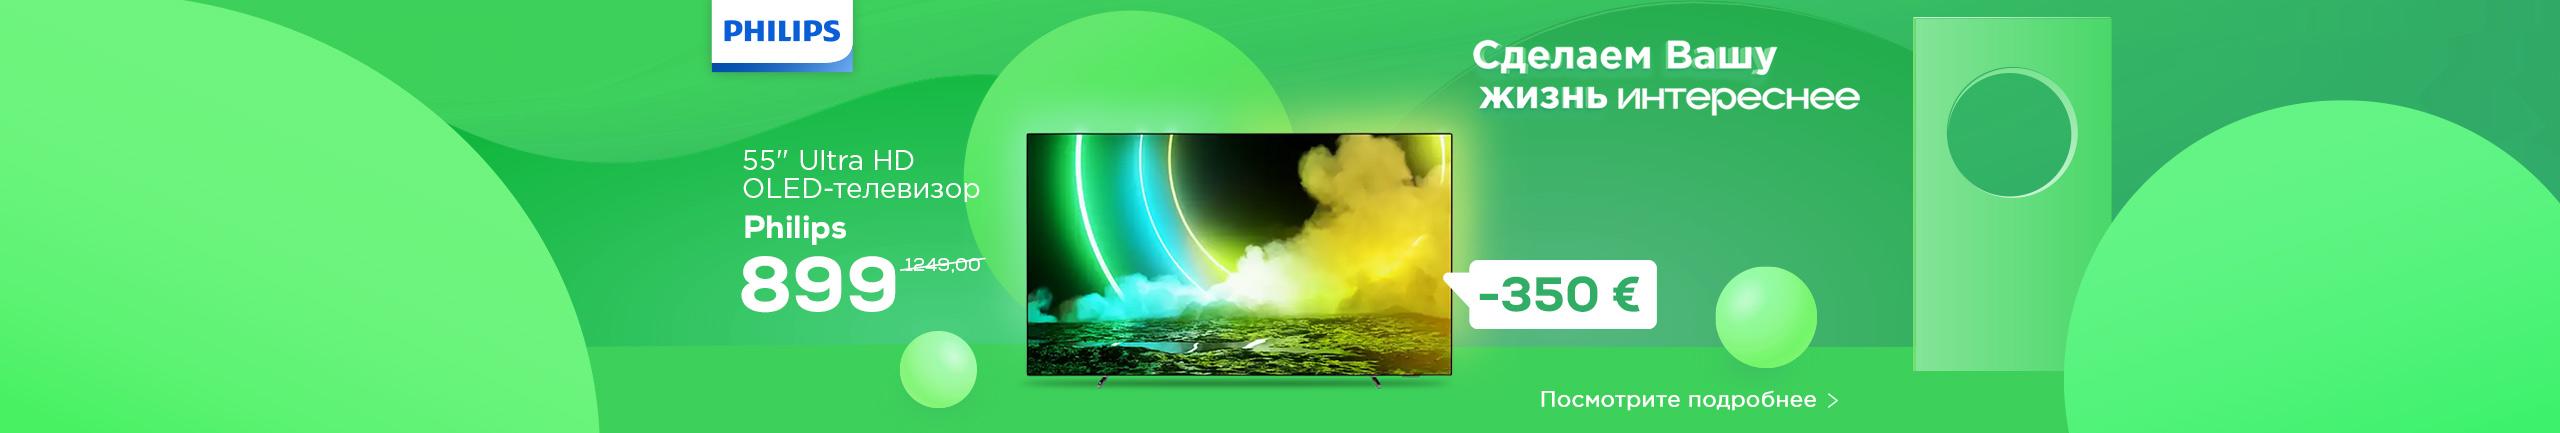 FPS Сделаем Вашу жизнь проще! 55'' Ultra HD OLED-телевизор Philips